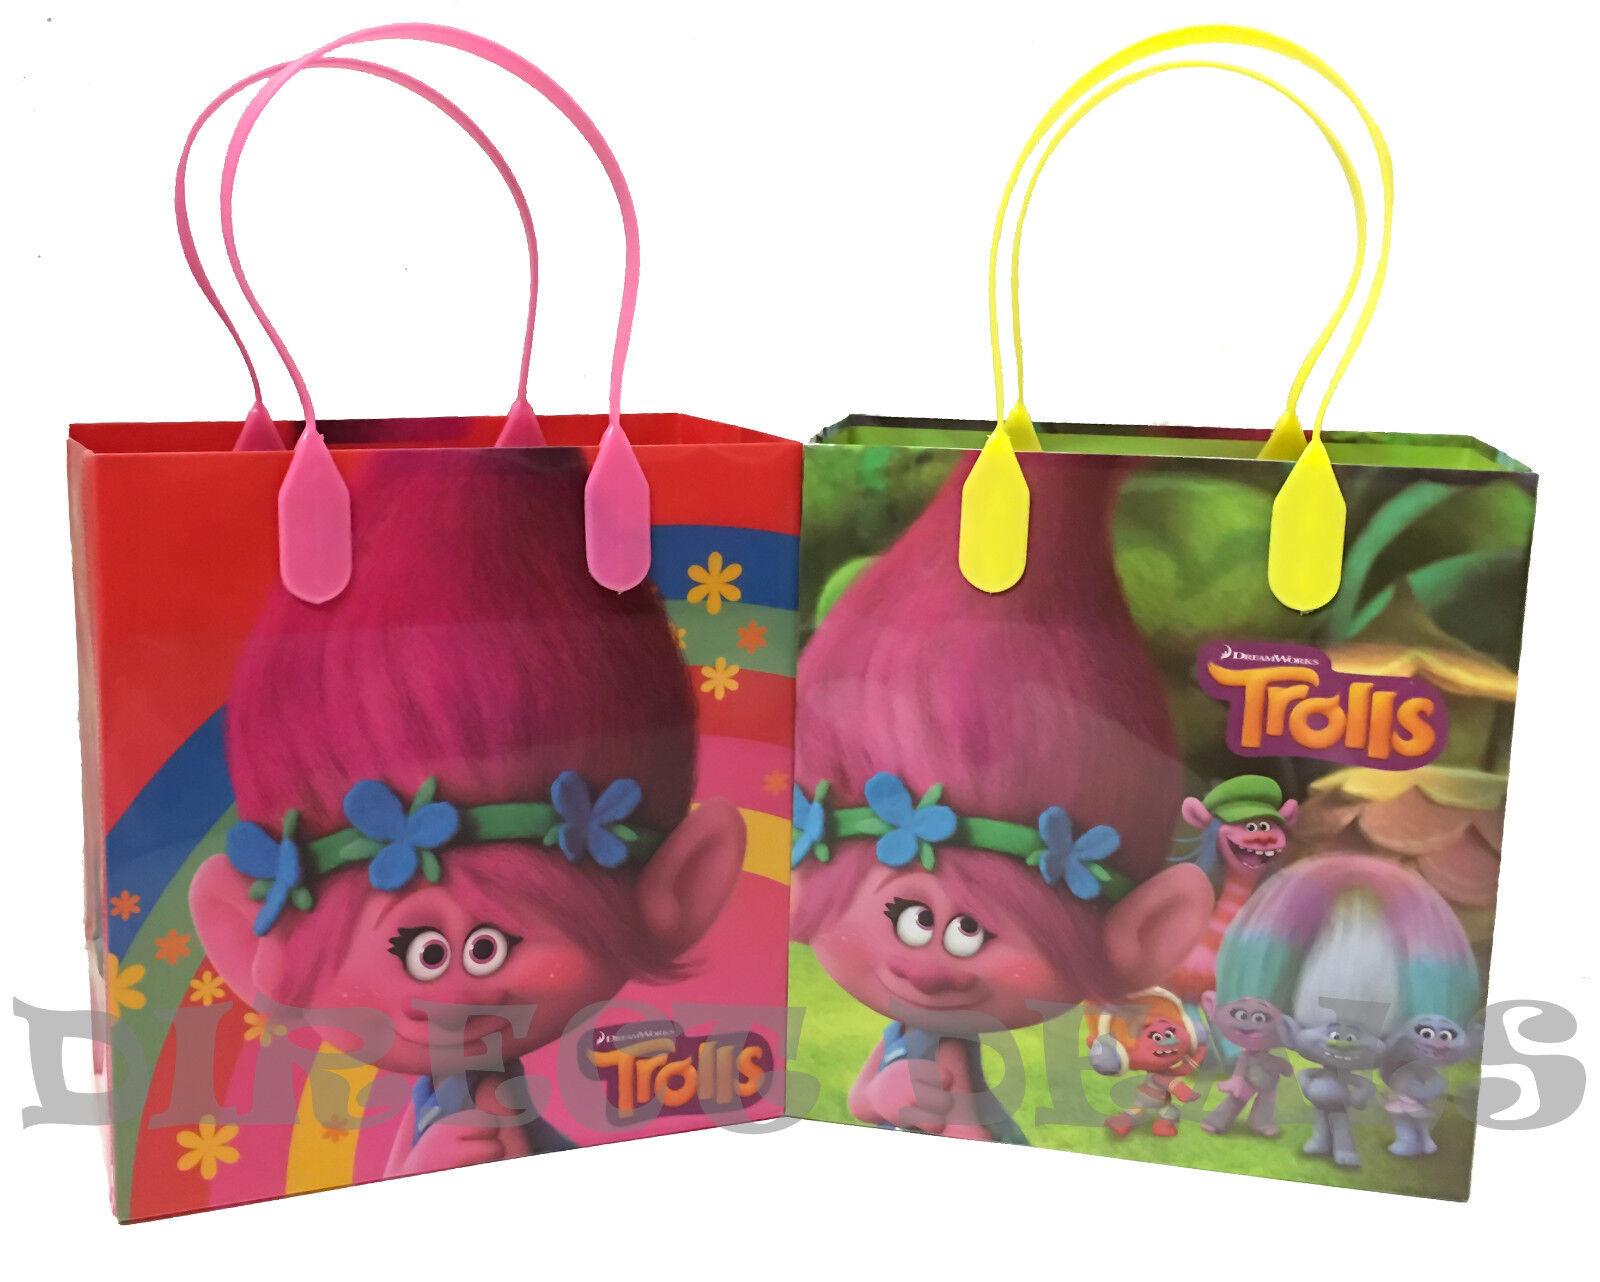 24 pcs DreamWorks Trolls Movie Party Favor Bags Treat Birthday Gift Sack Fun Bag